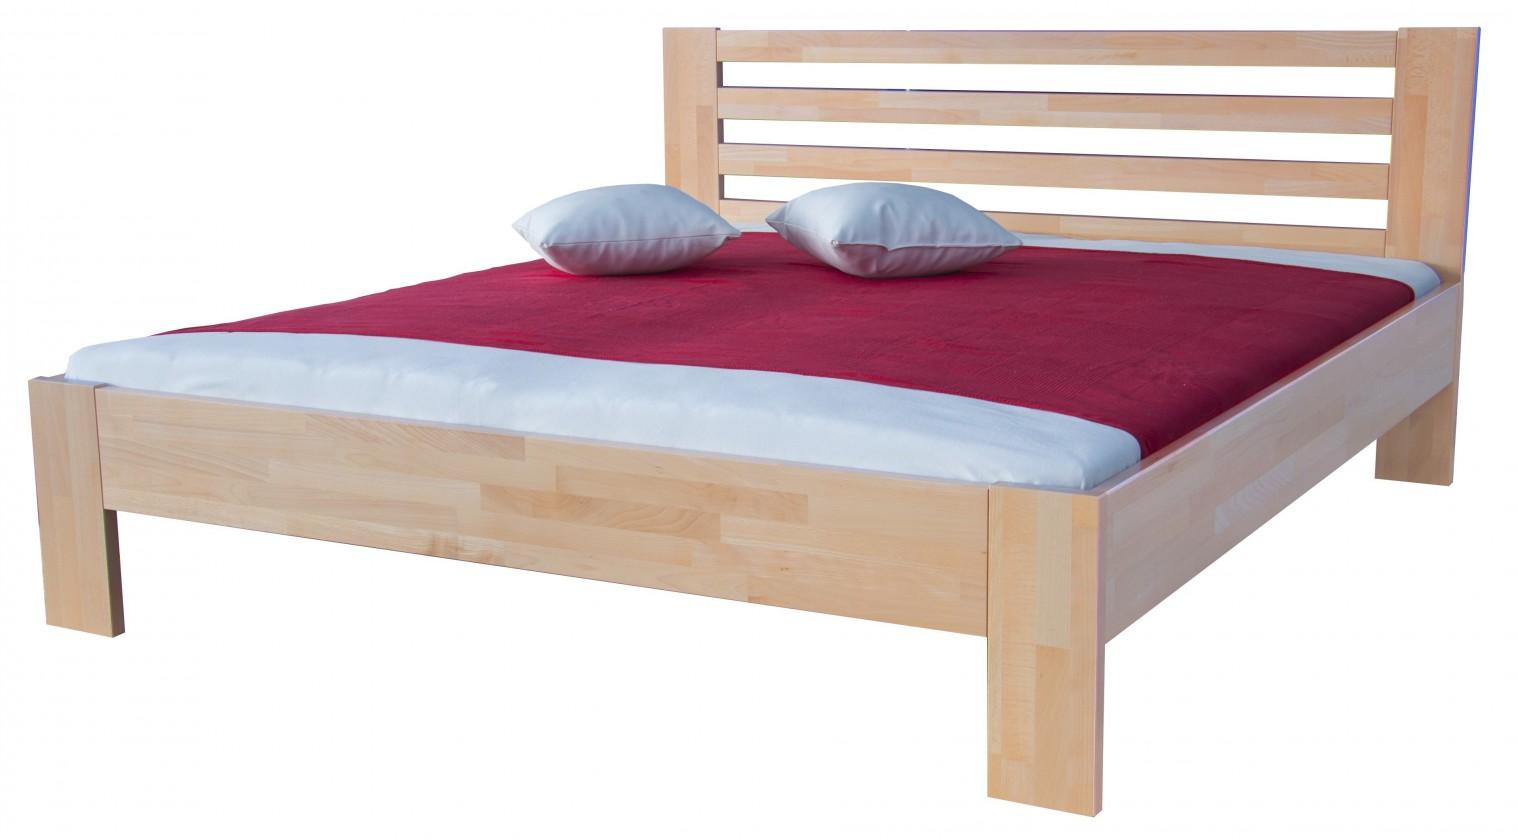 Masívne postele Rám postele Ines, 160x200, masívny buk